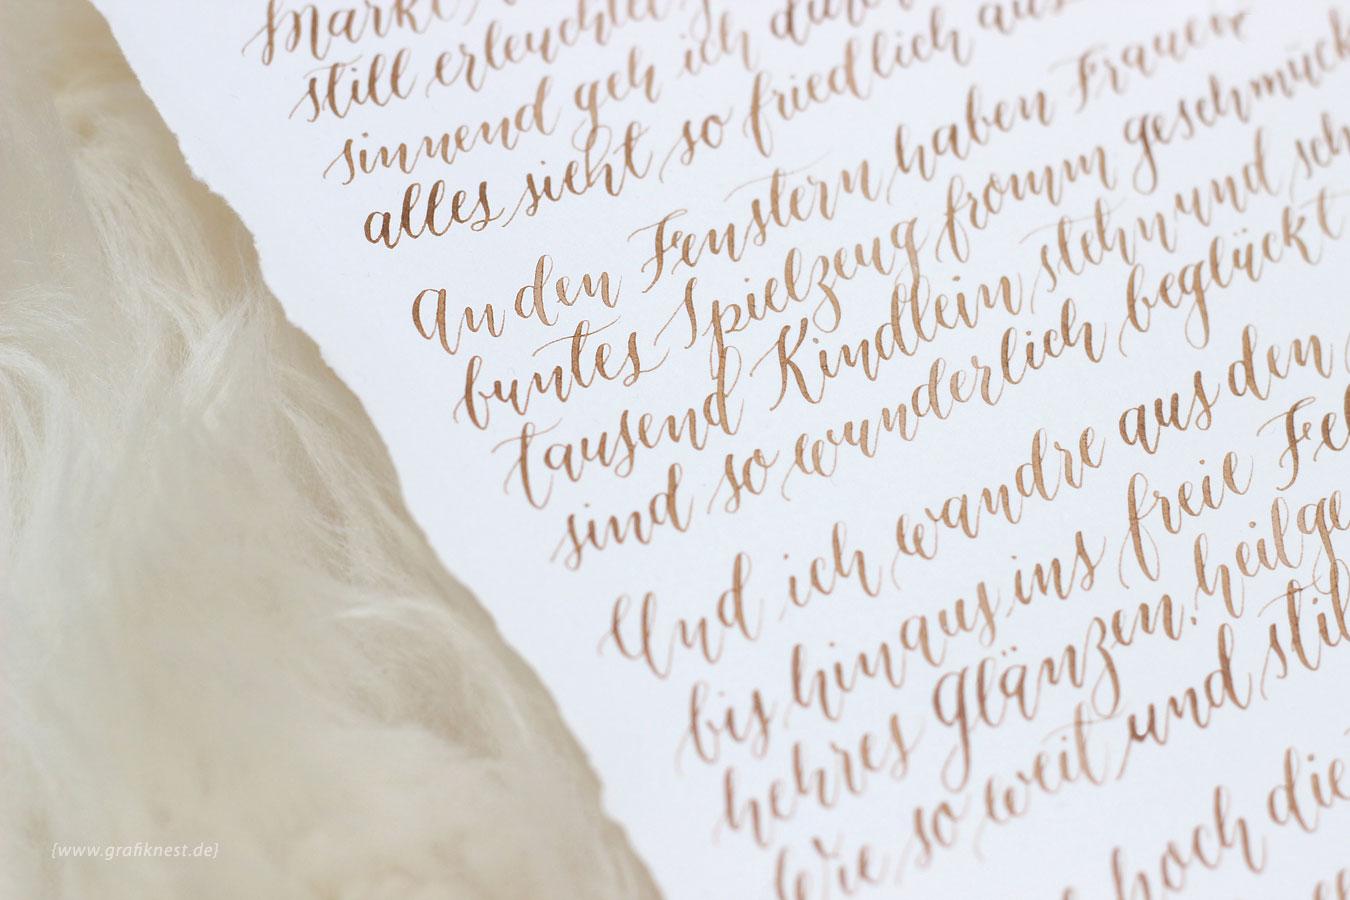 Kalligrafiertes Wehnachtsgedicht